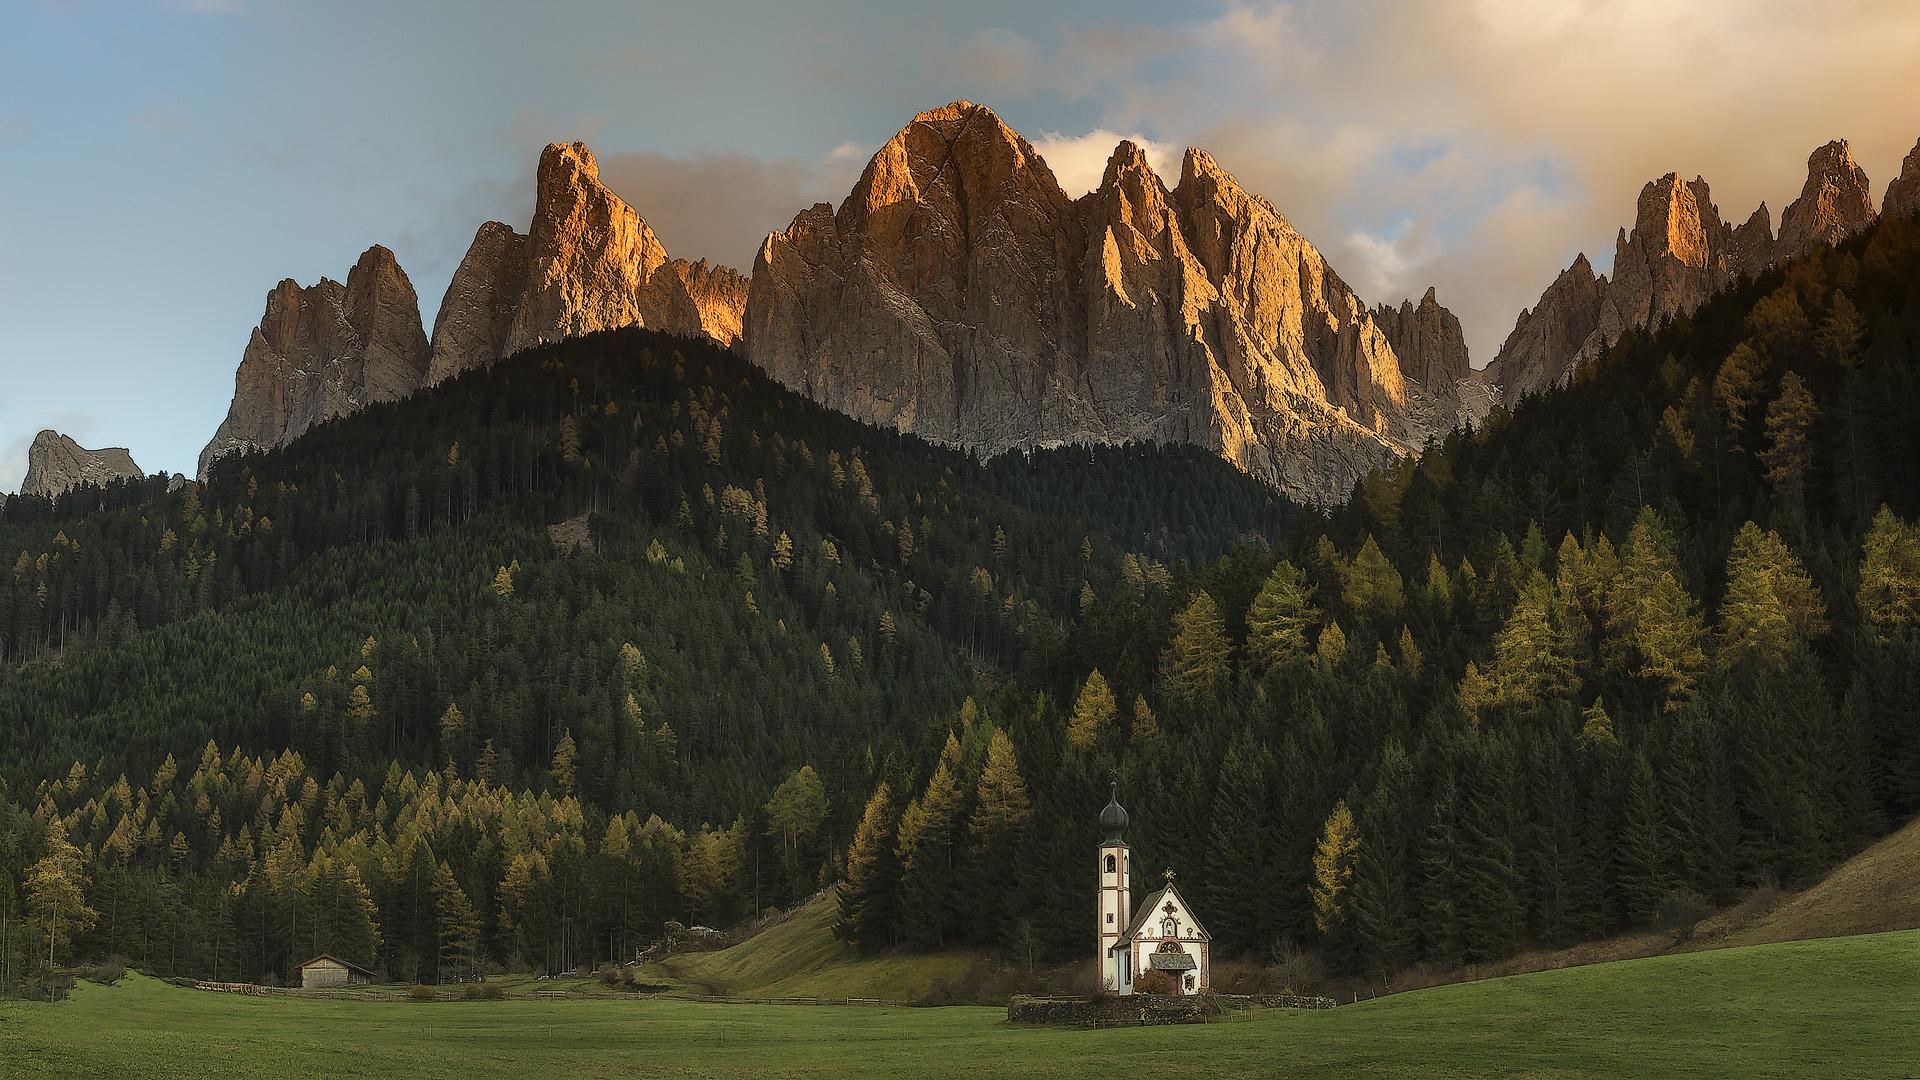 St. Johann in Ranui - Geißlerspitzen - Villnößtal - Südtirol